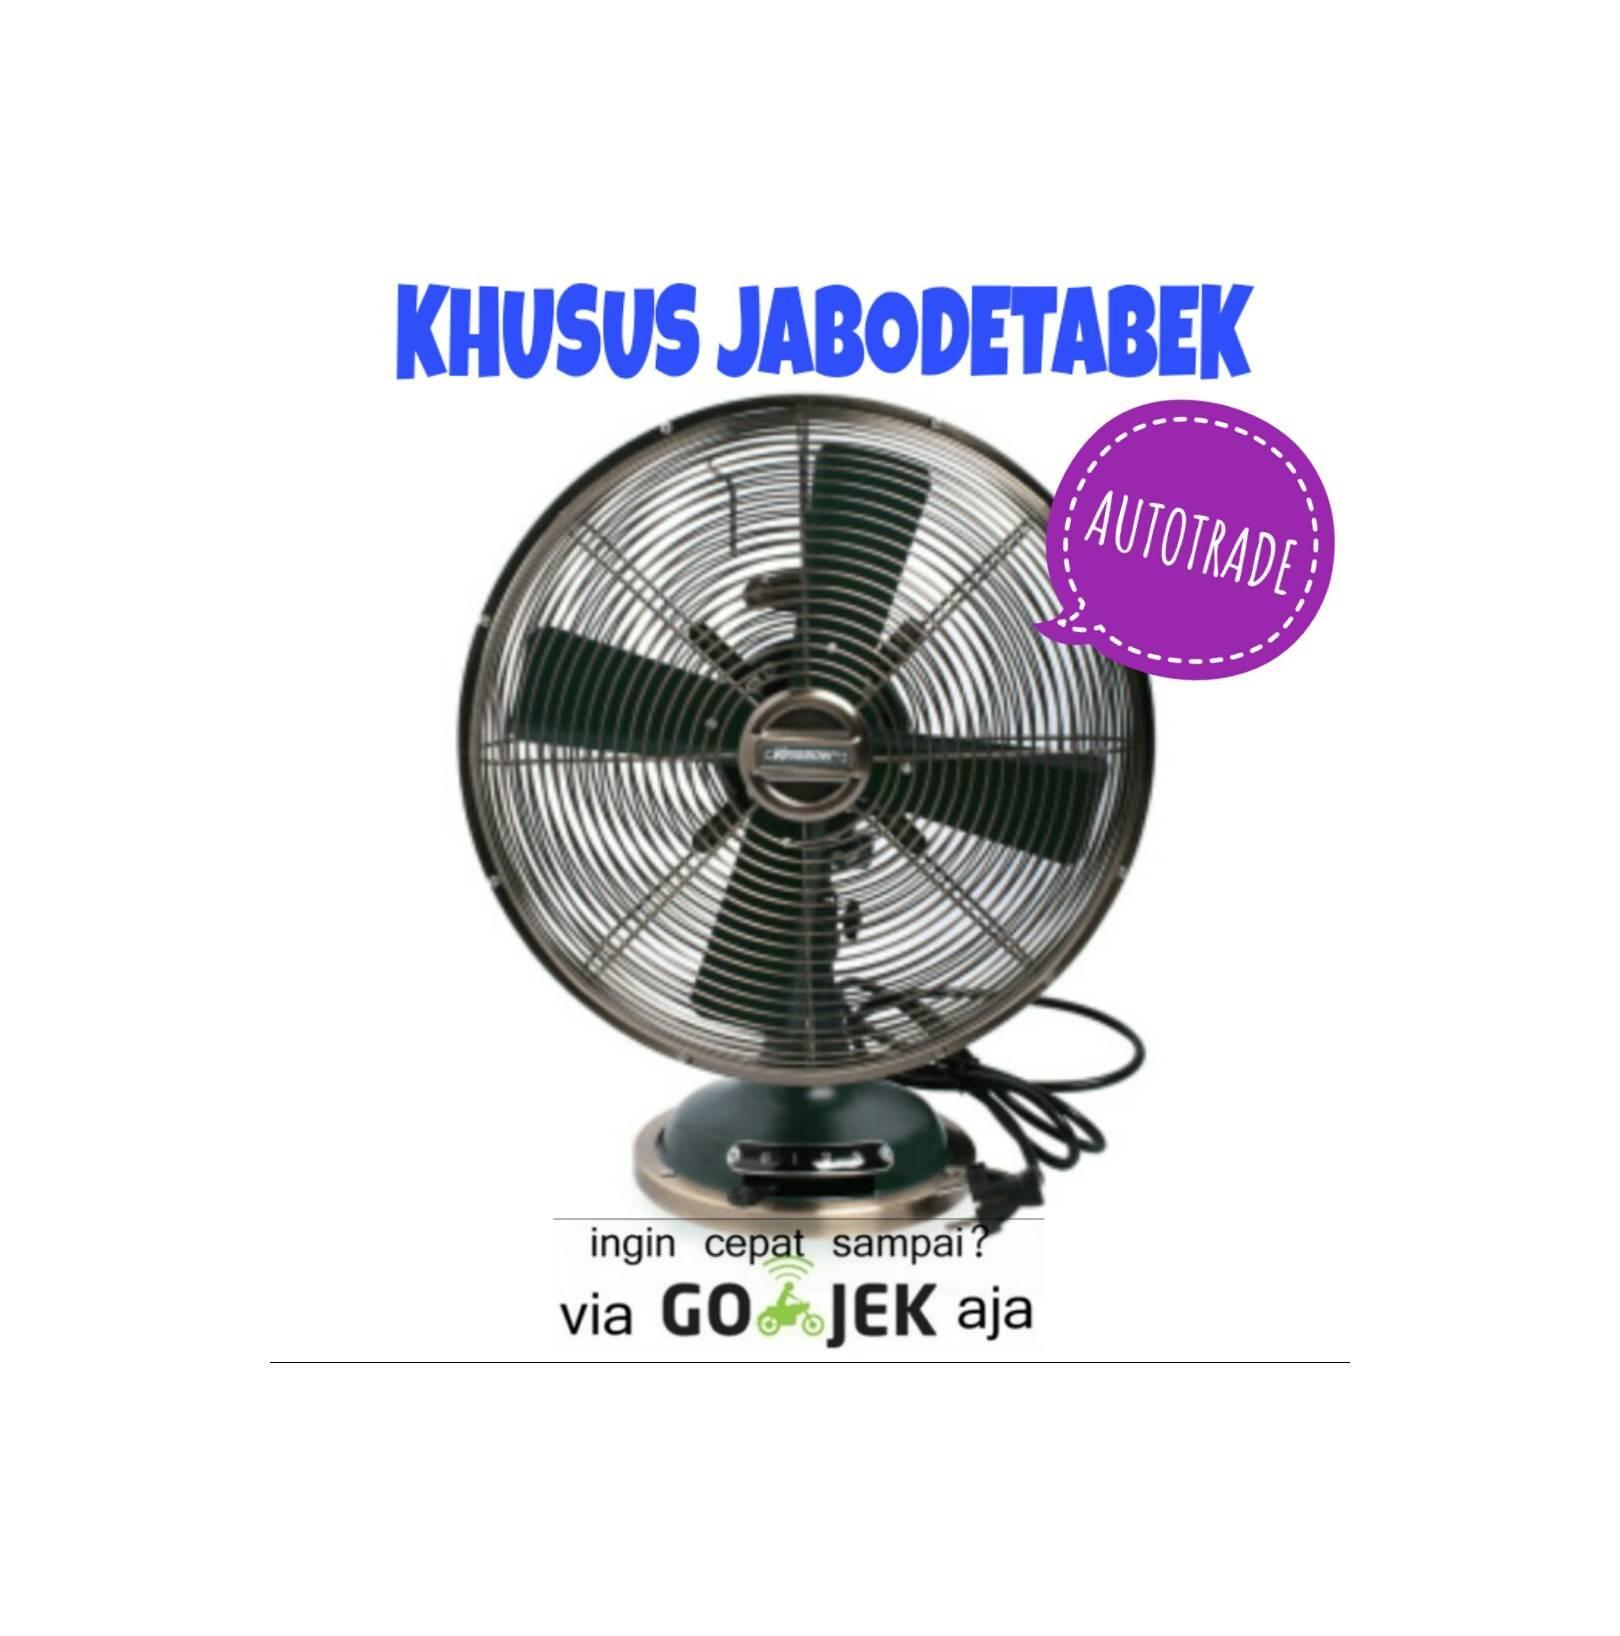 KIPAS ANGIN MEJA KRISBOW UNIK KLASIK 30 CM 35 W 12 inch